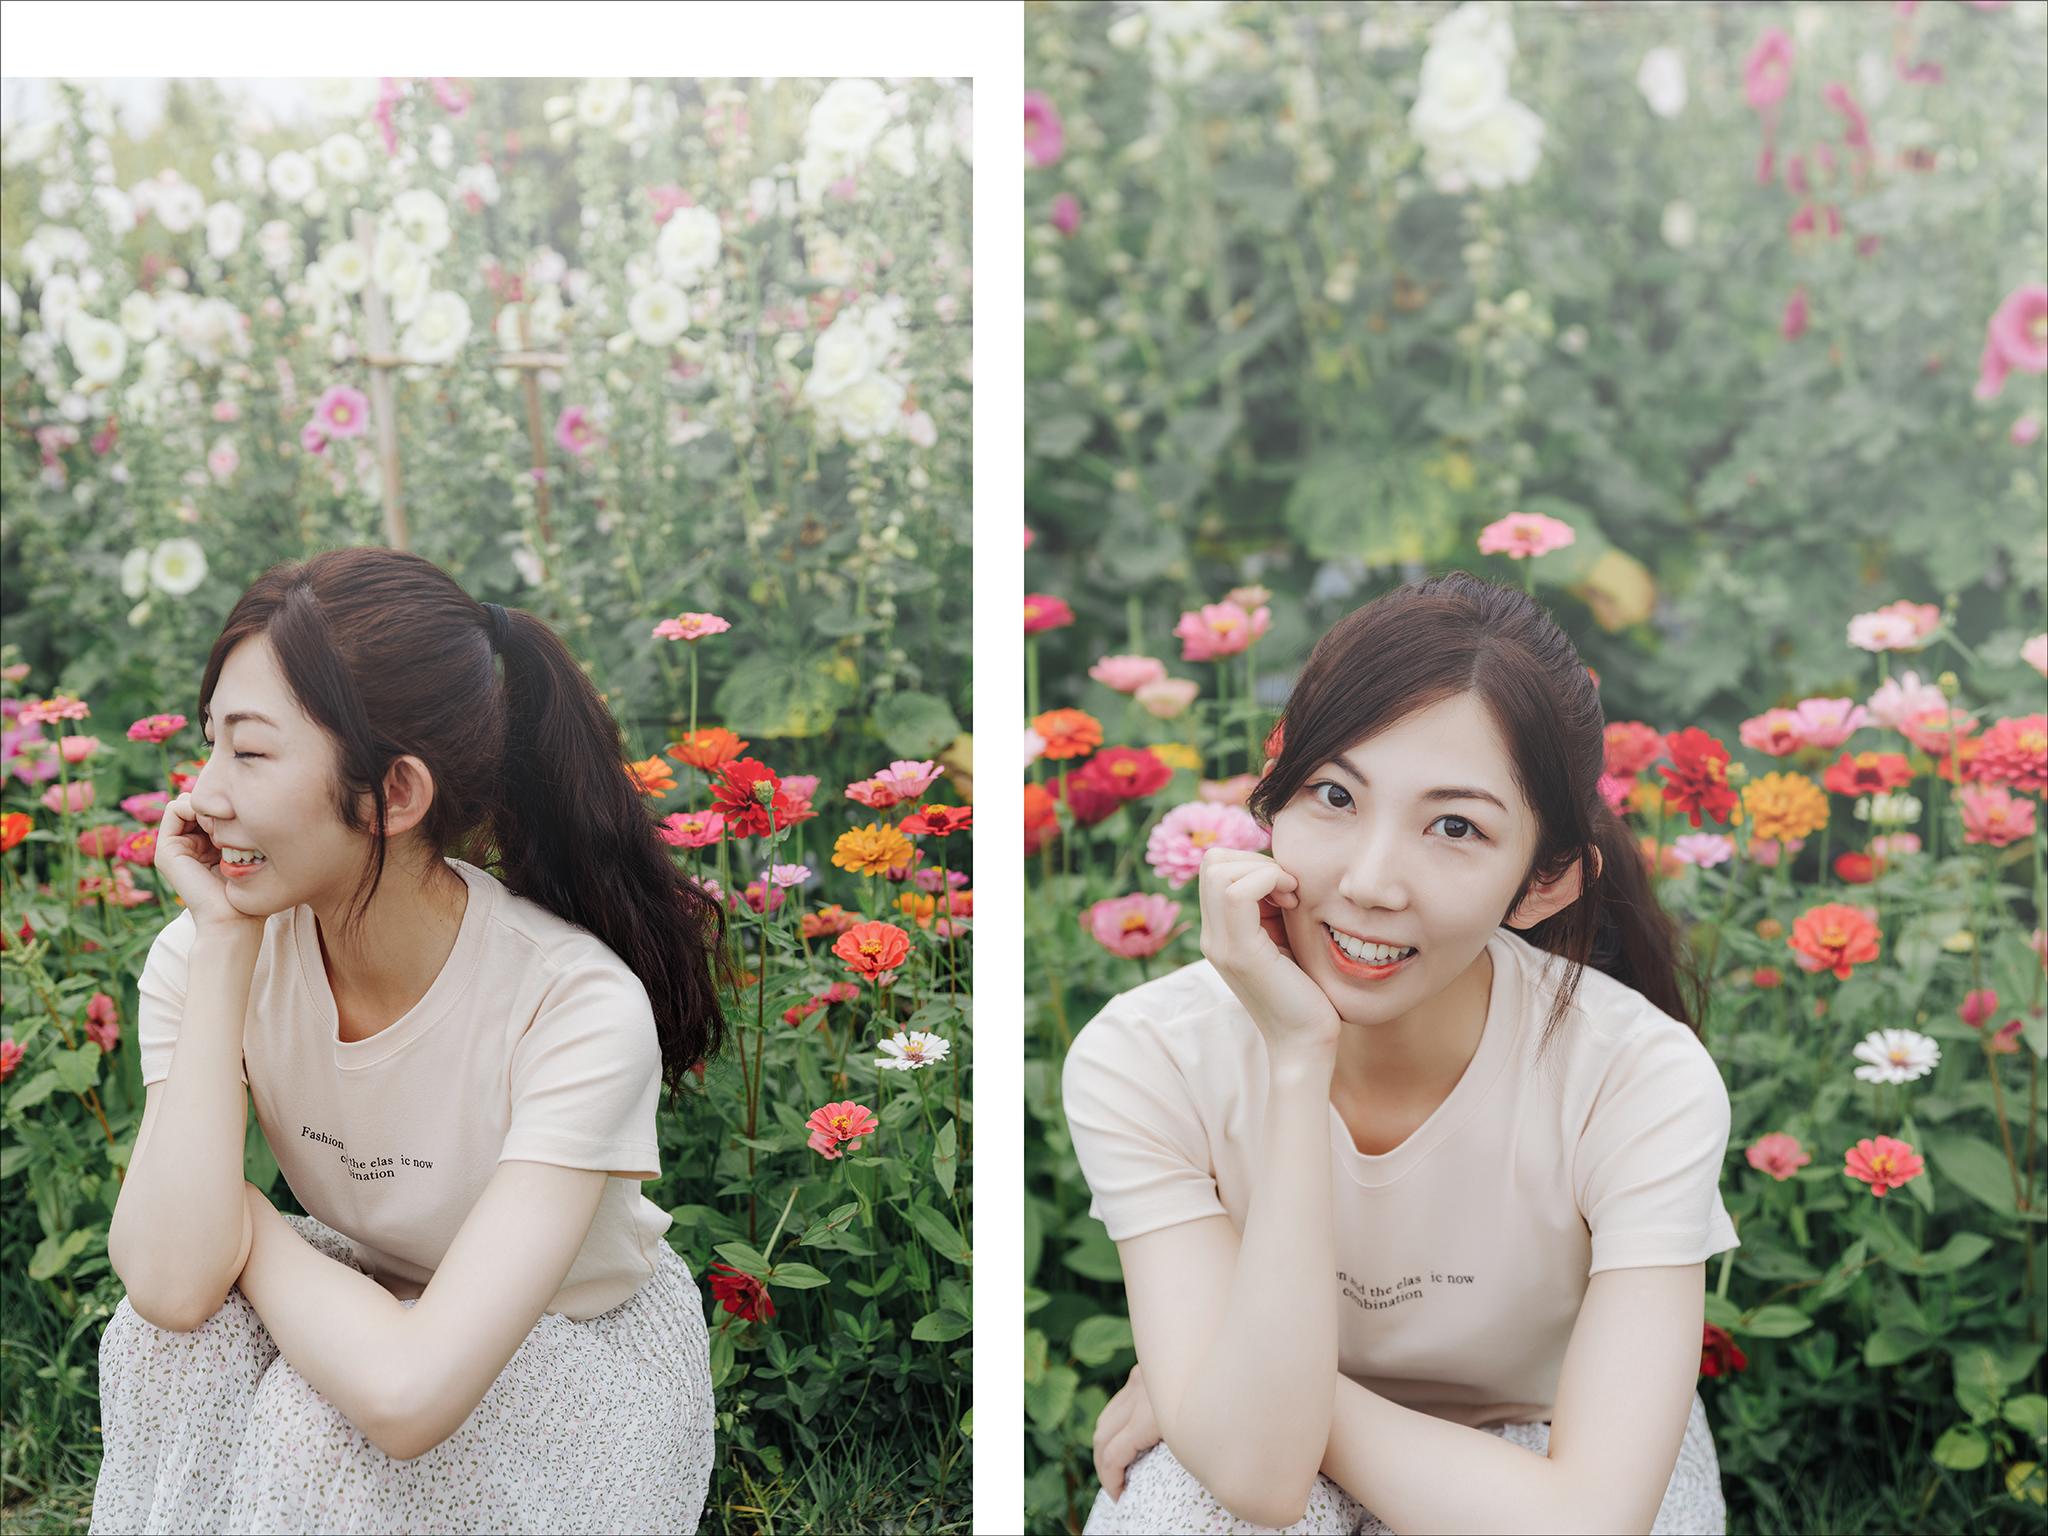 49785299738 df0223c1d7 o - 【春季寫真】+Shan+